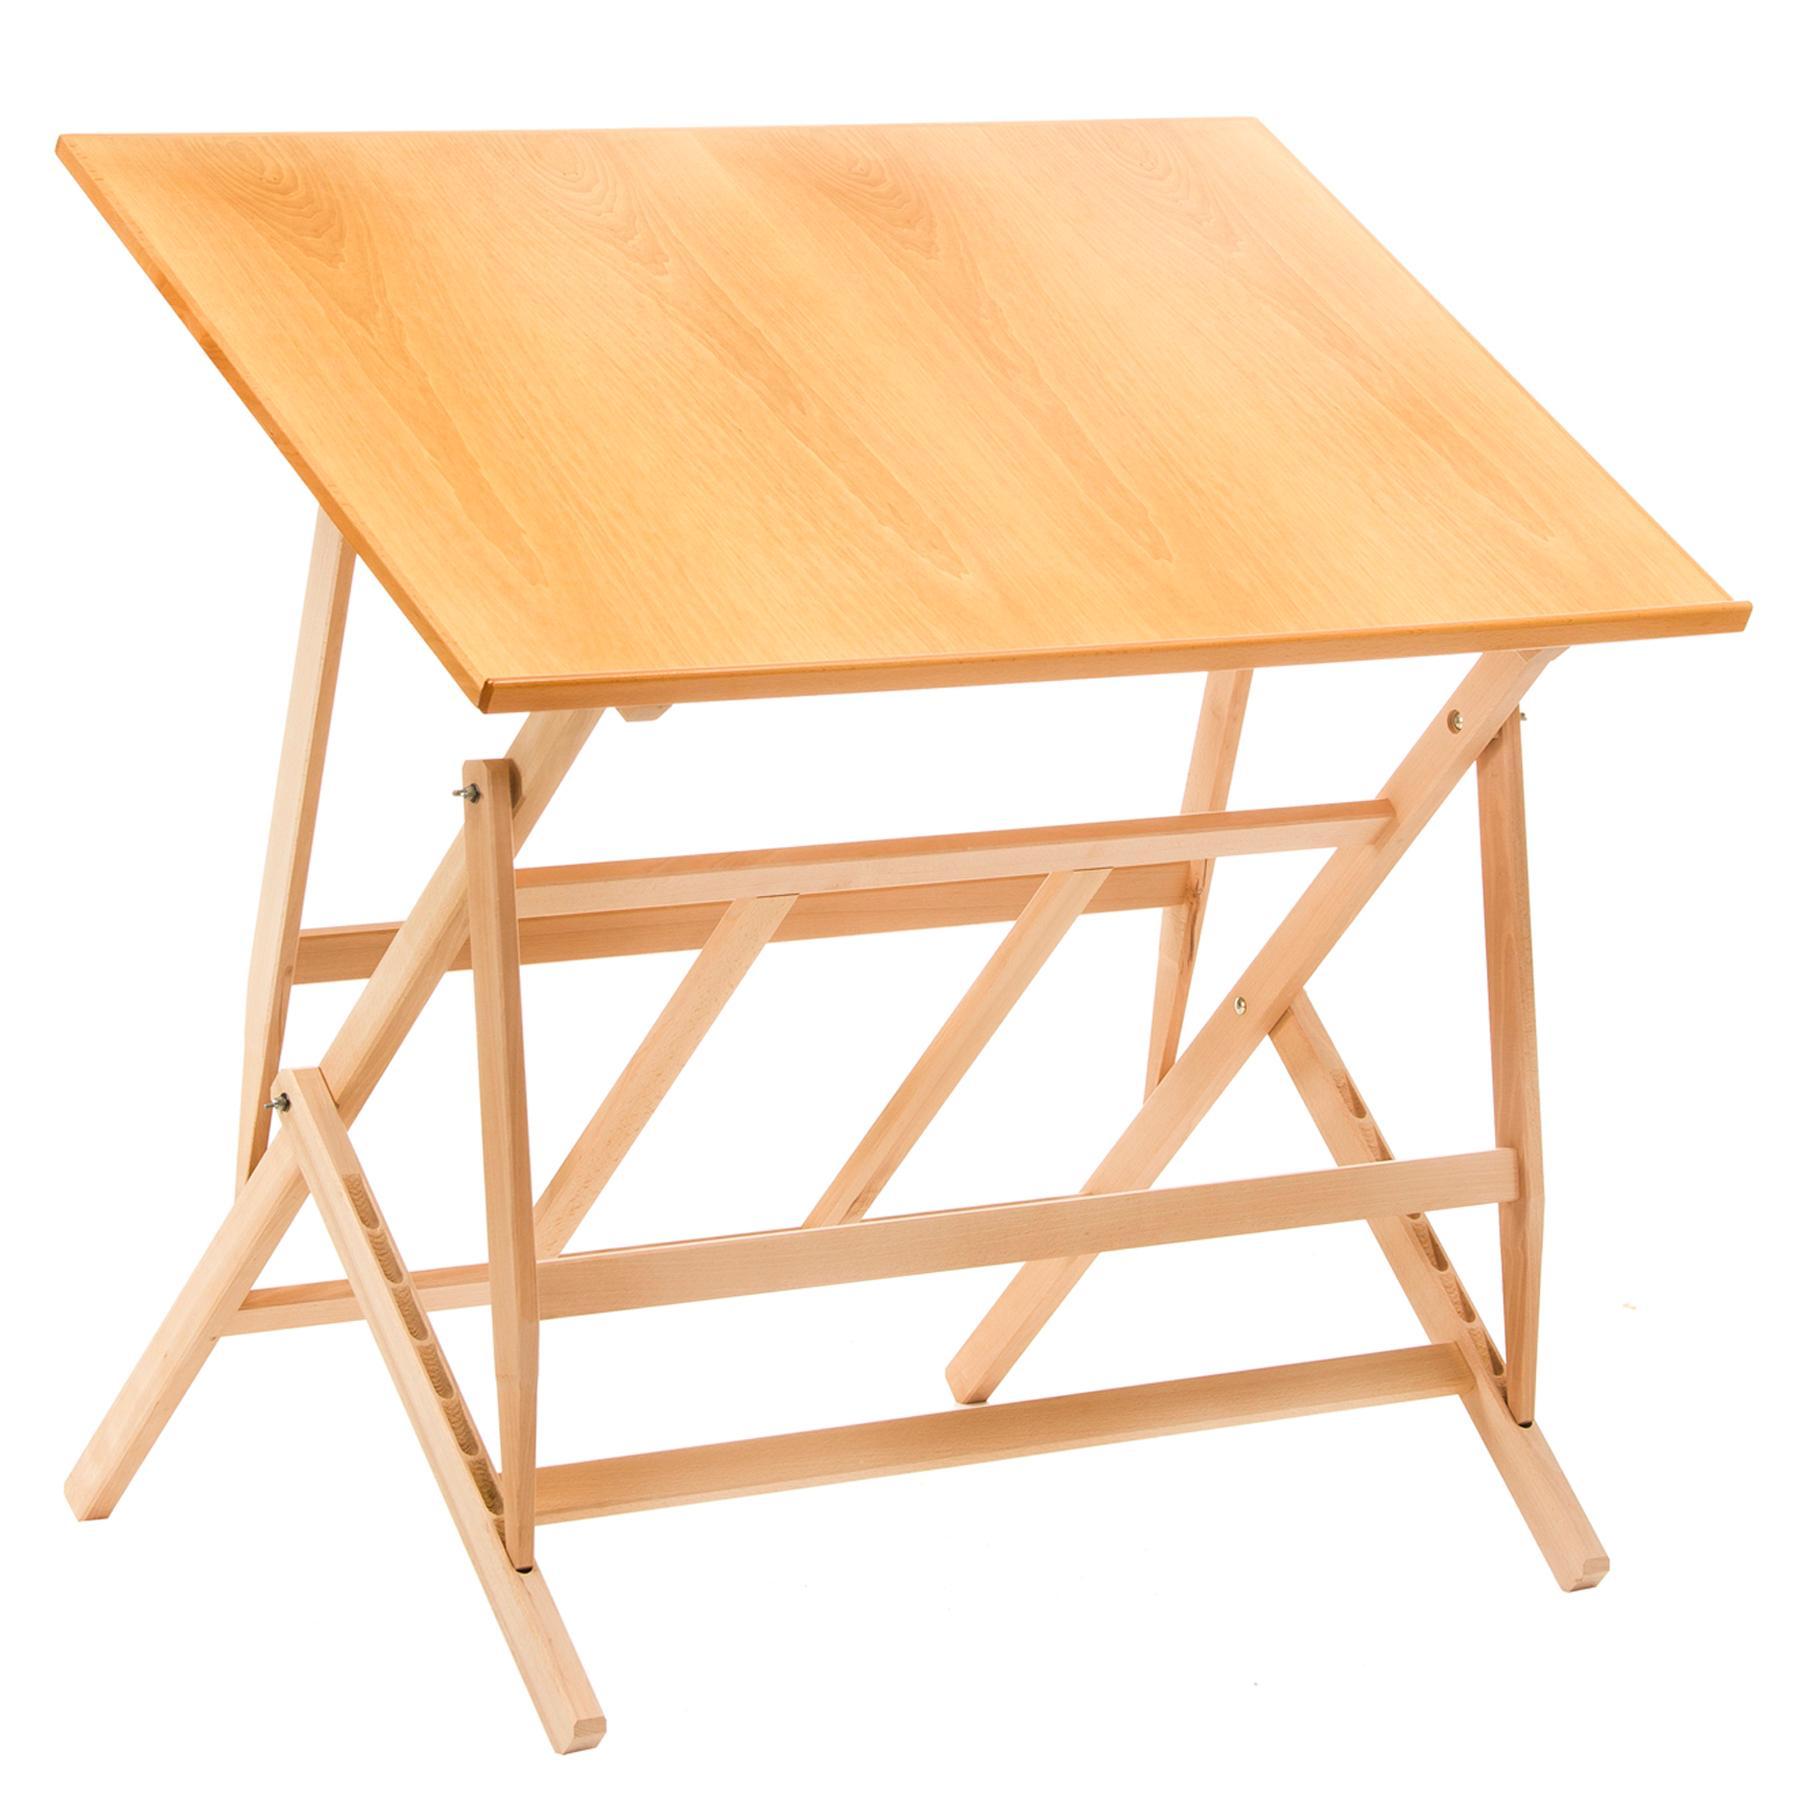 Lienzos levante 1610101111 mesa de dibujo profesional for Mesa de dibujo ikea